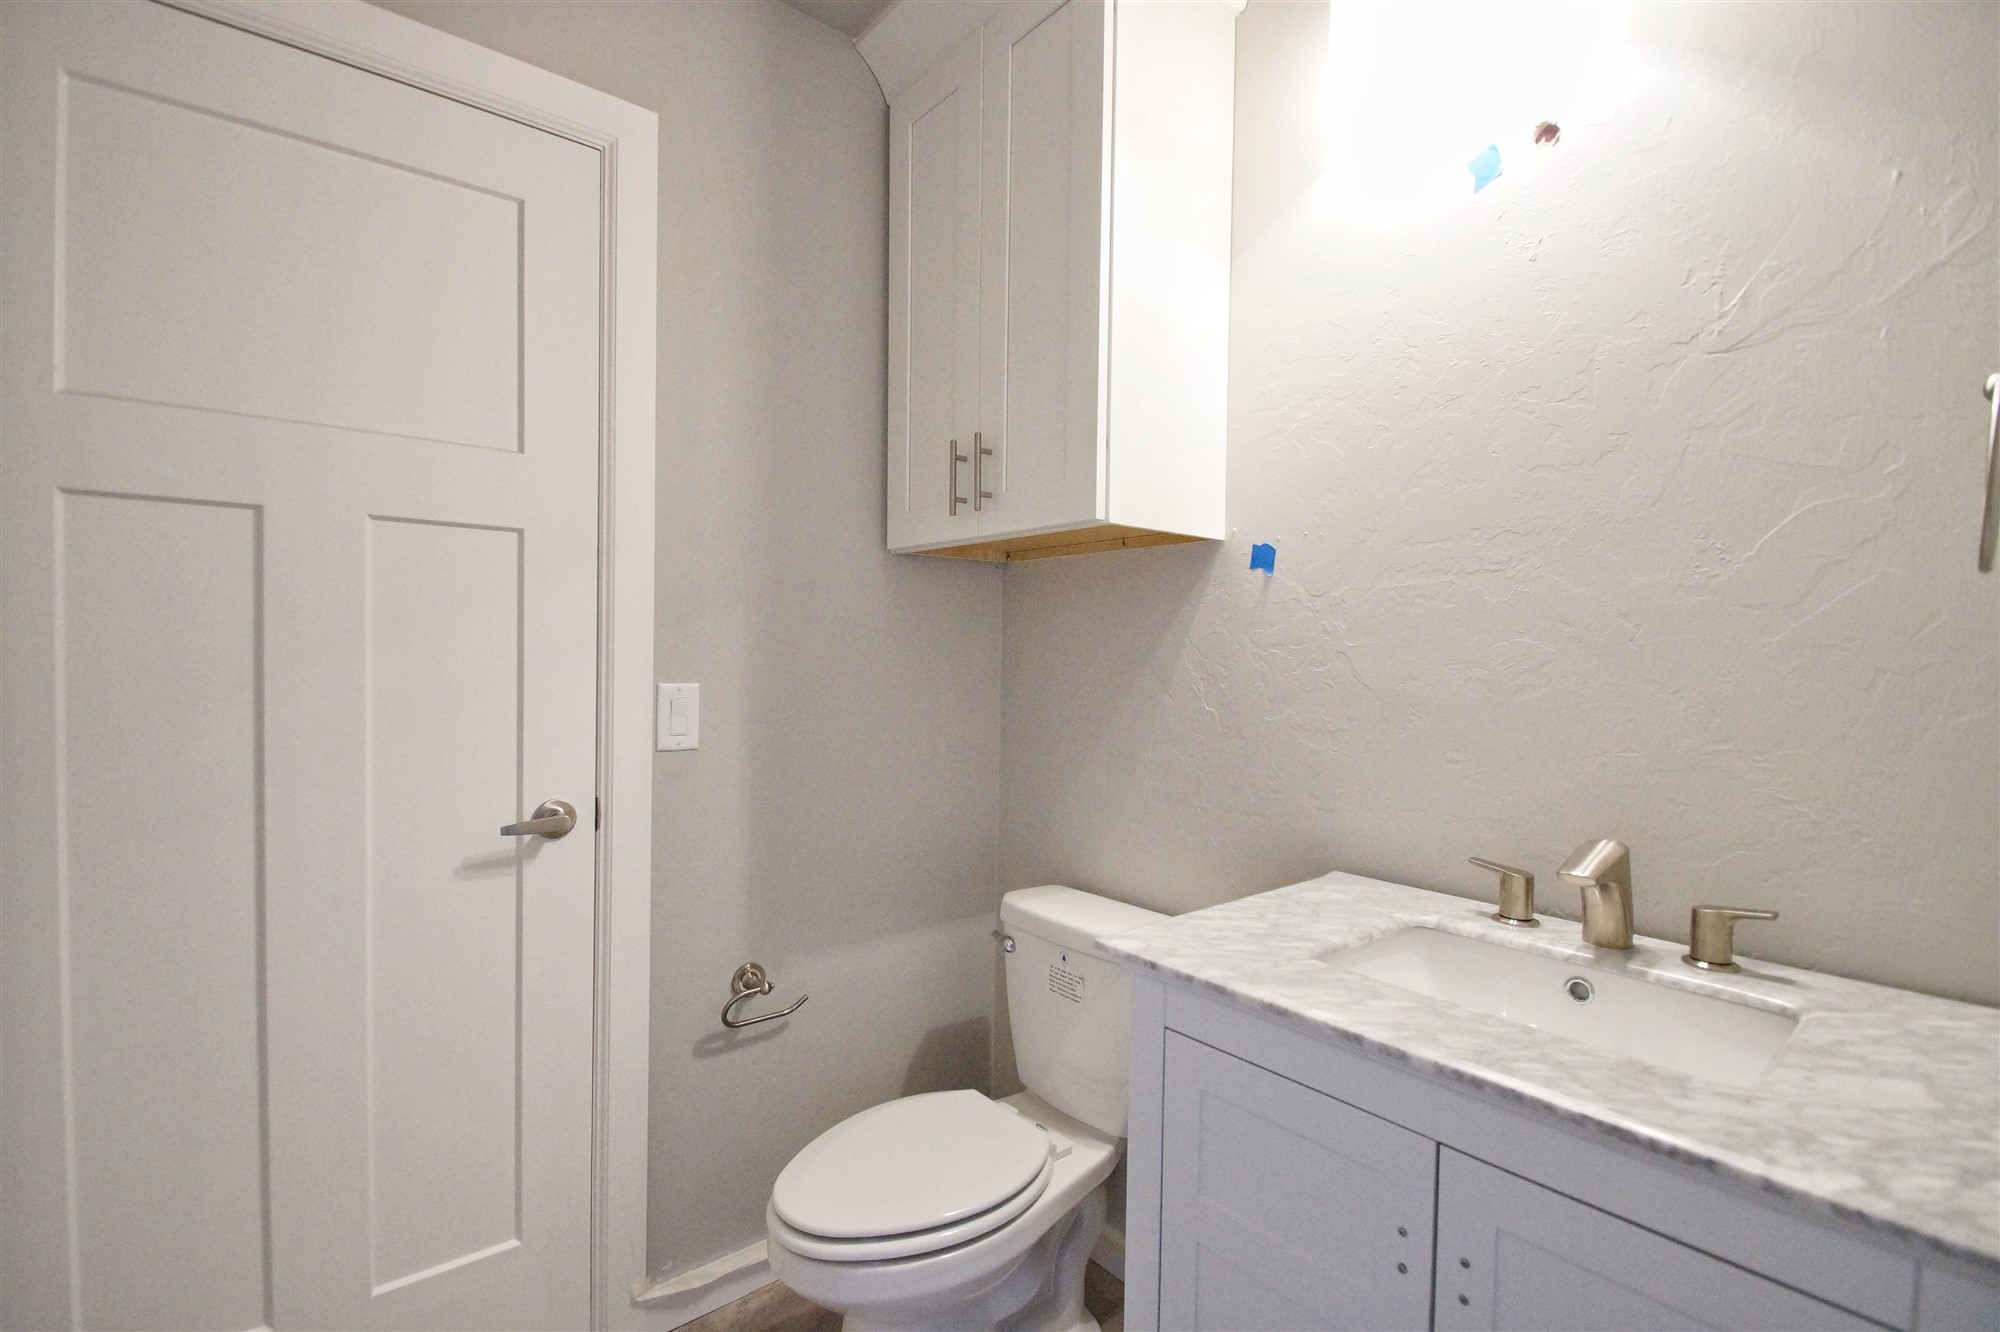 14 - Bathroom.jpg